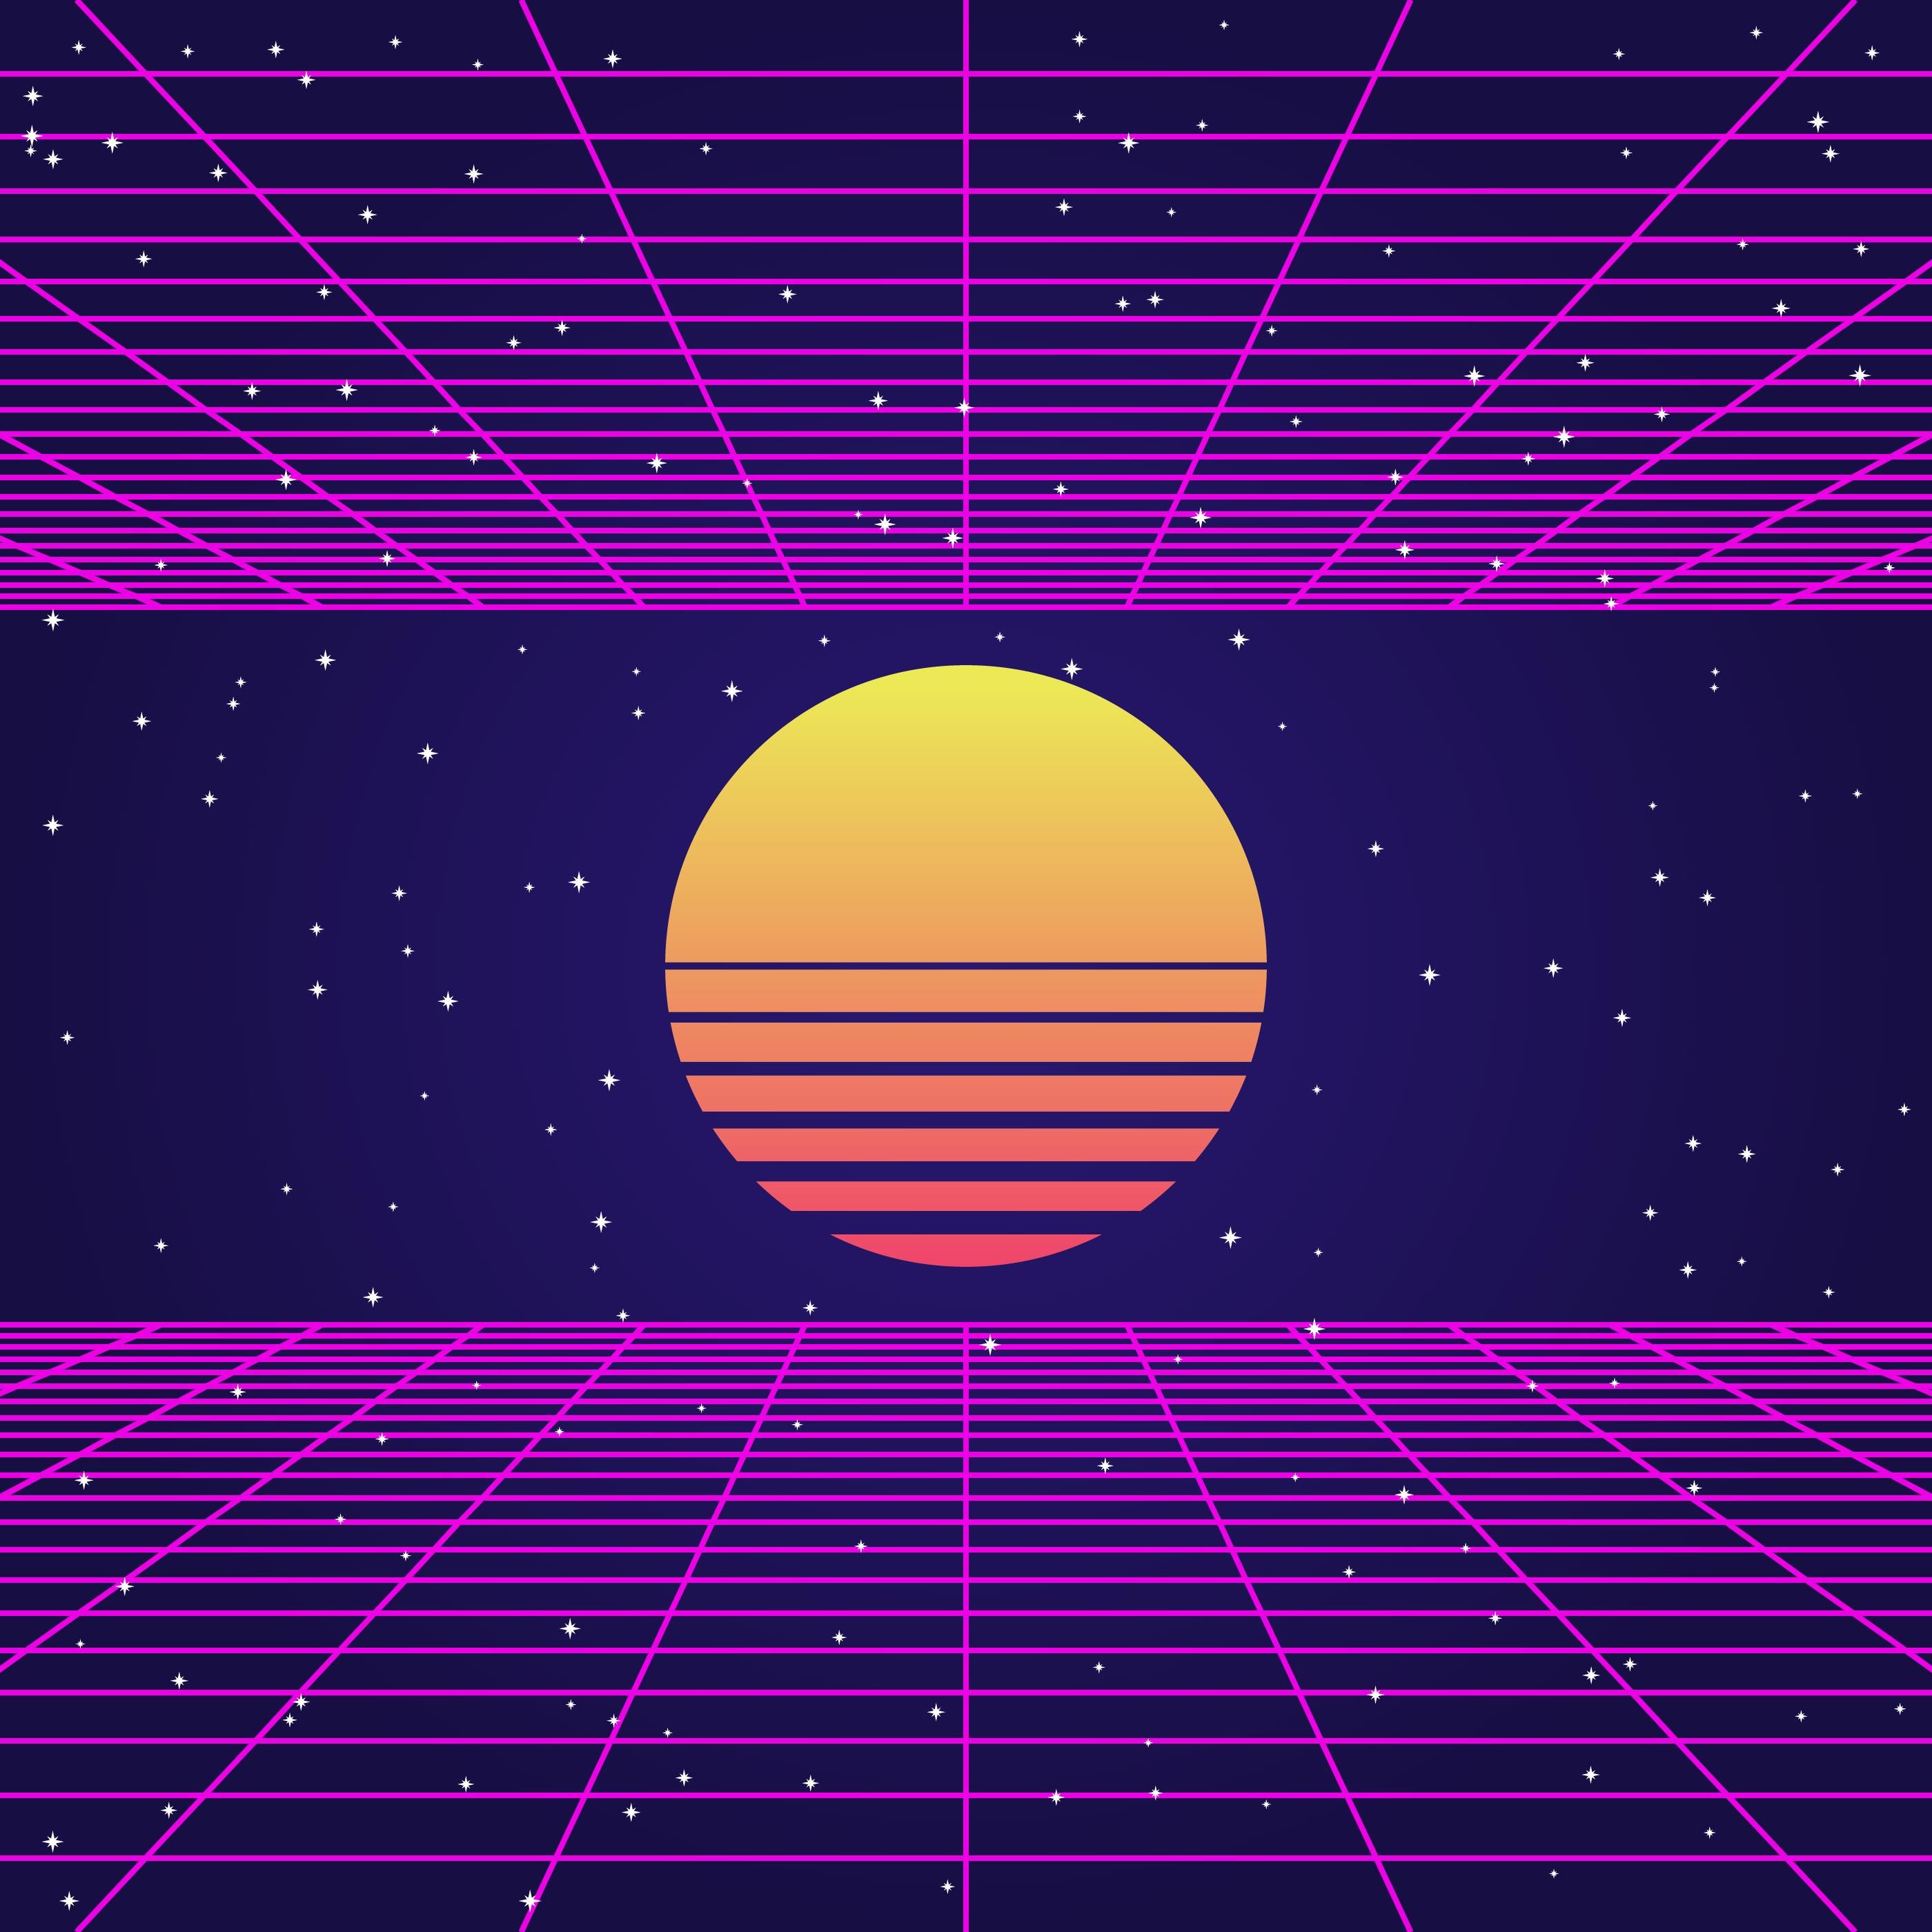 80s Retro Free Vector Art 1 324 Free Downloads